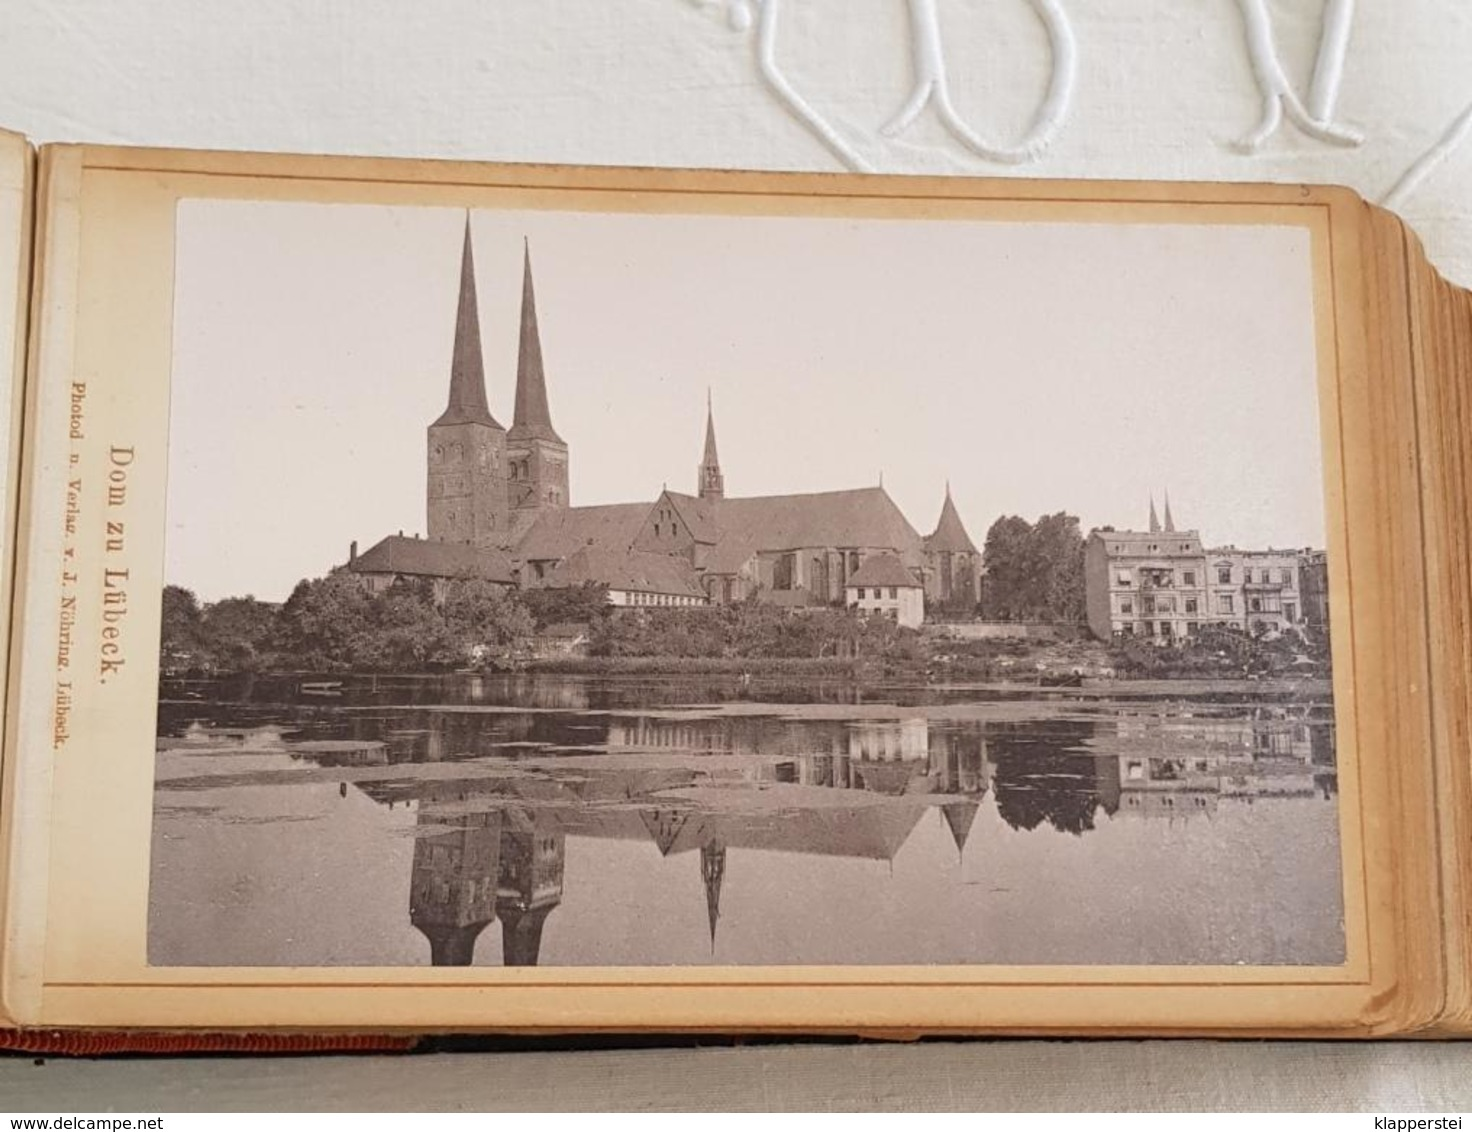 Album 72 Photos 1886 Kabinett Fotos Lübeck Lüneburg Berlin Potsdam Sanssouci Allemagne Deutschland - Photos